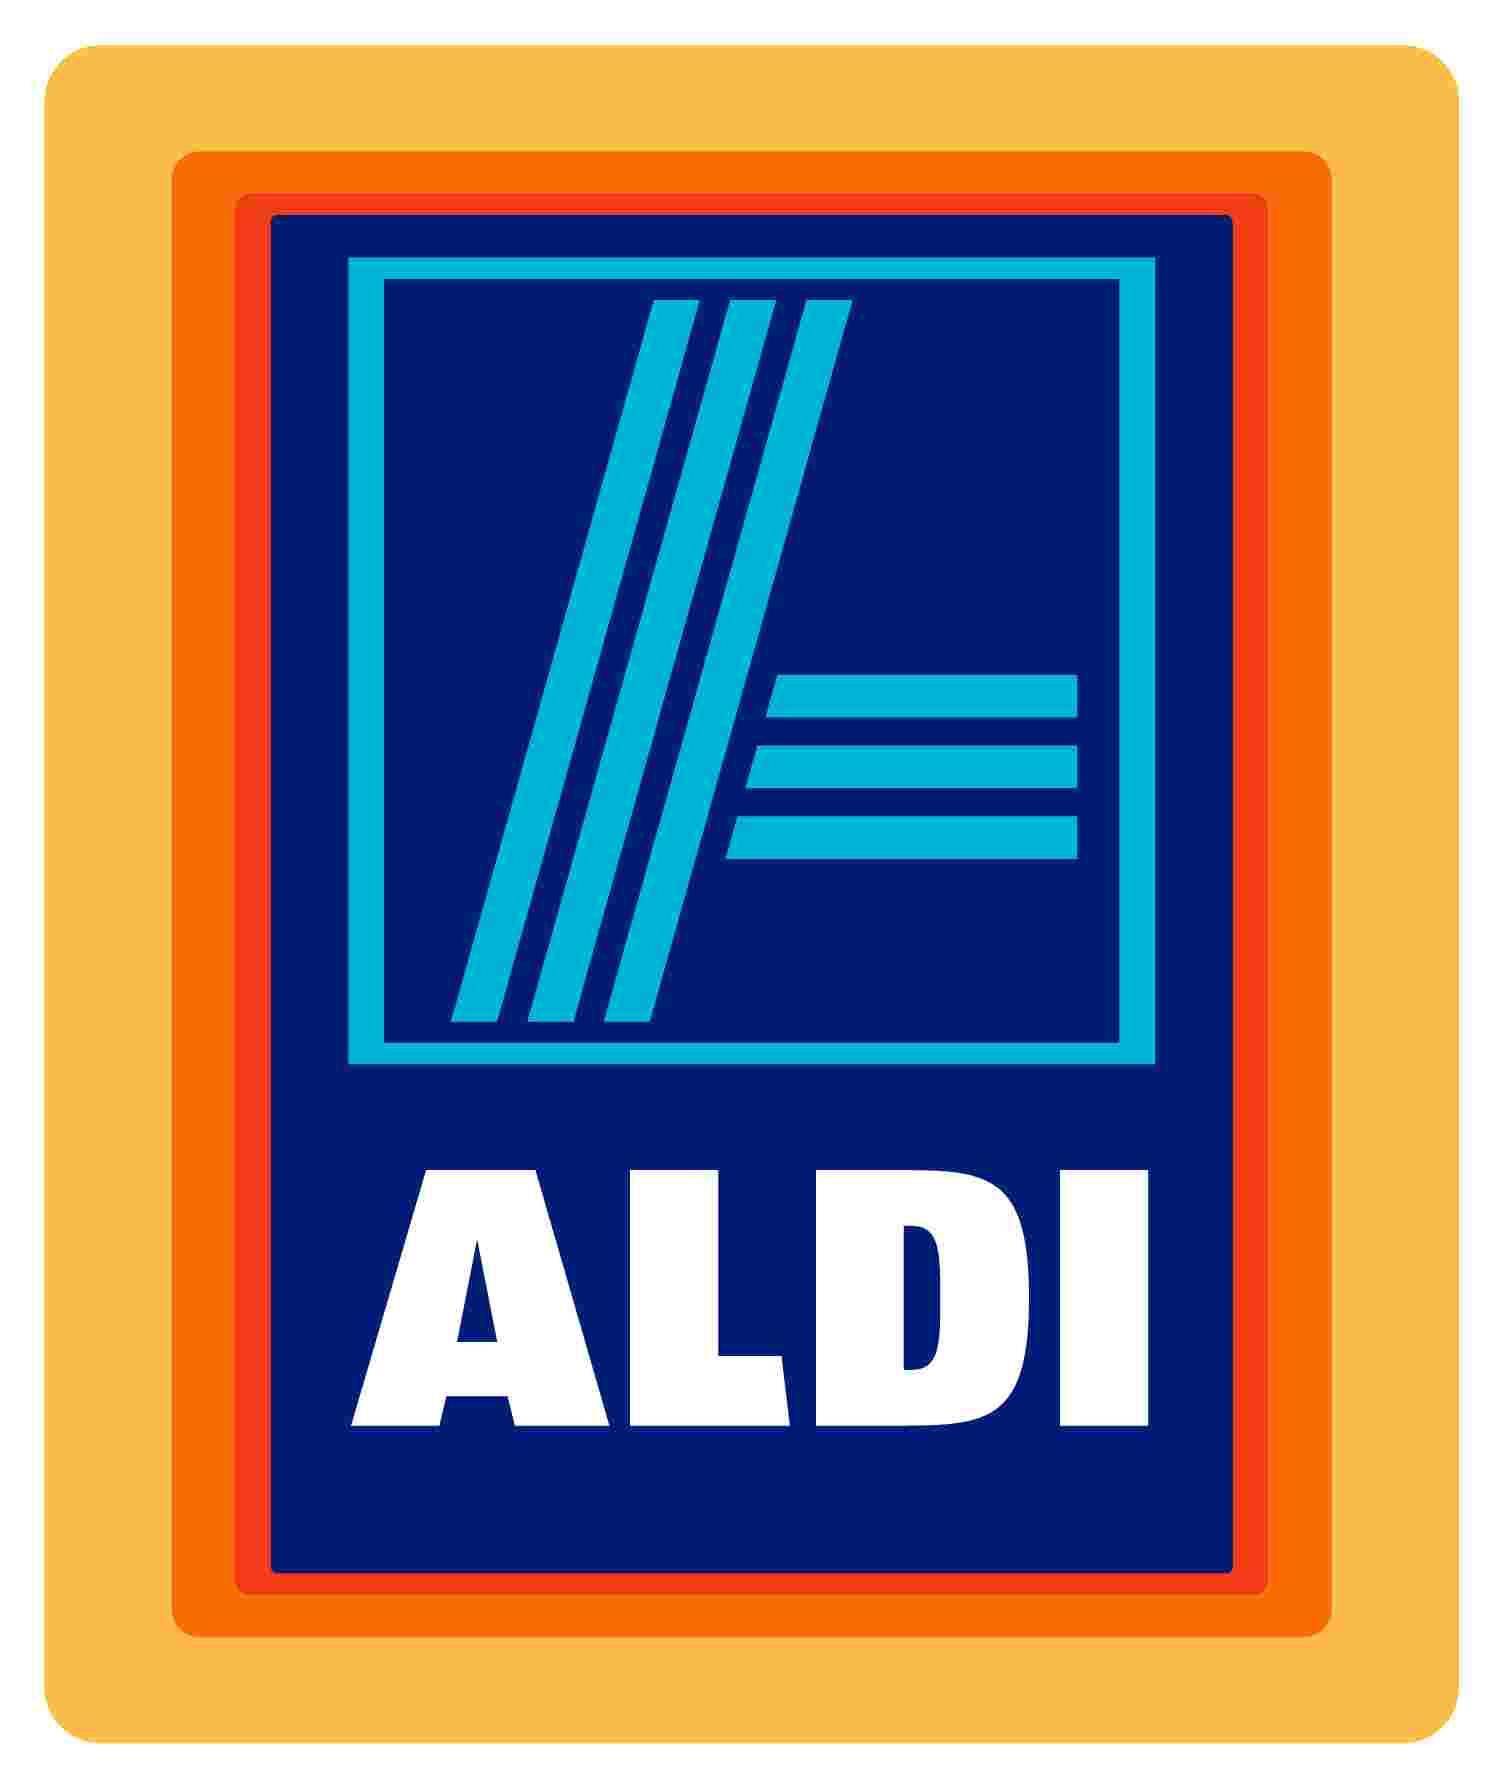 ALDI_3C_RGB_logo_kicsi_1.jpg